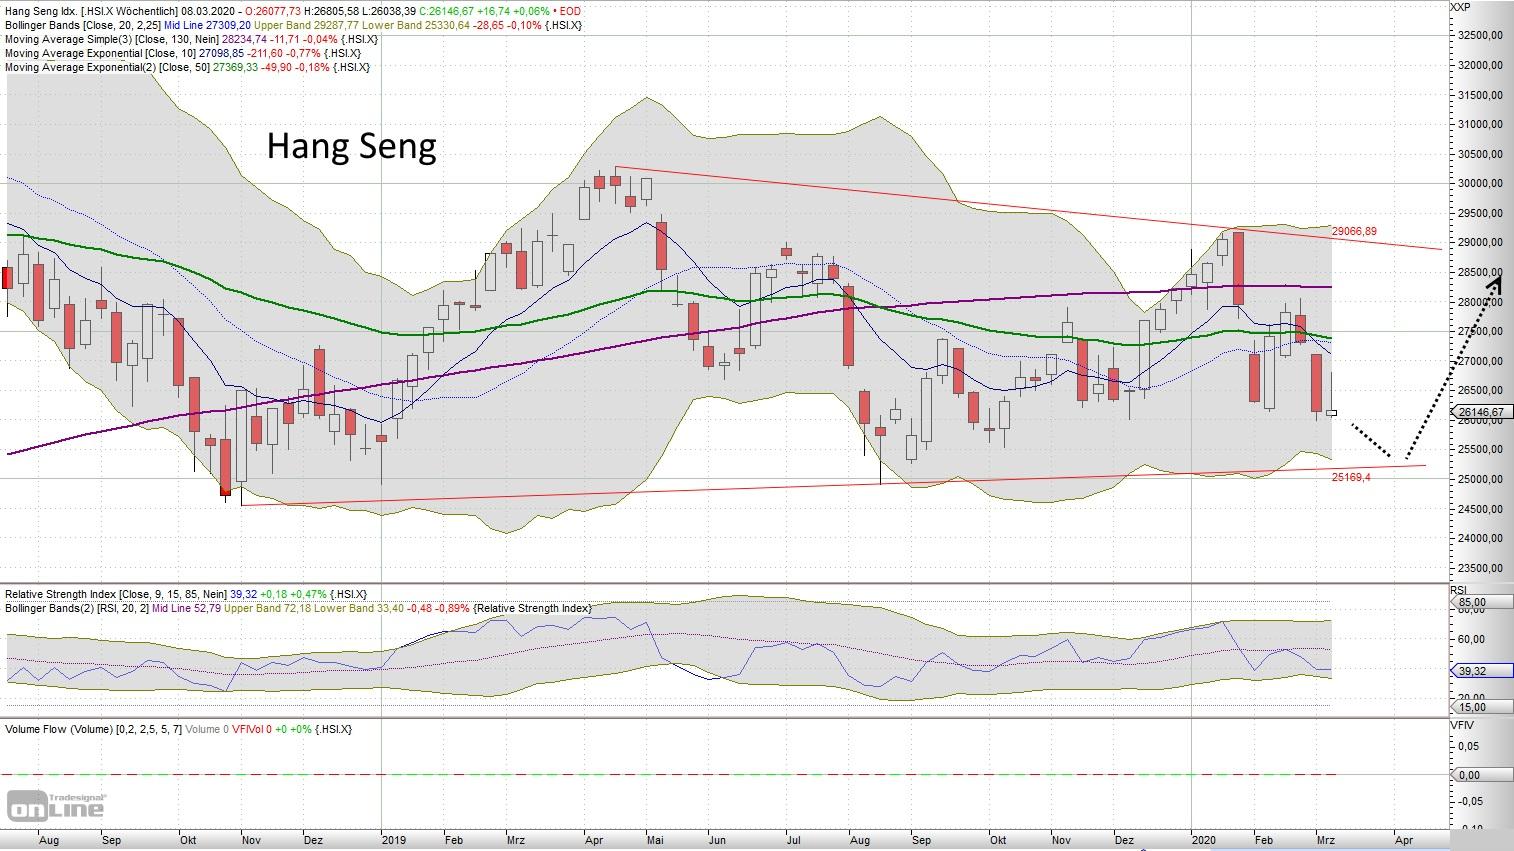 Hang Seng - aktuelle Chartanalyse von Lars Hattwig